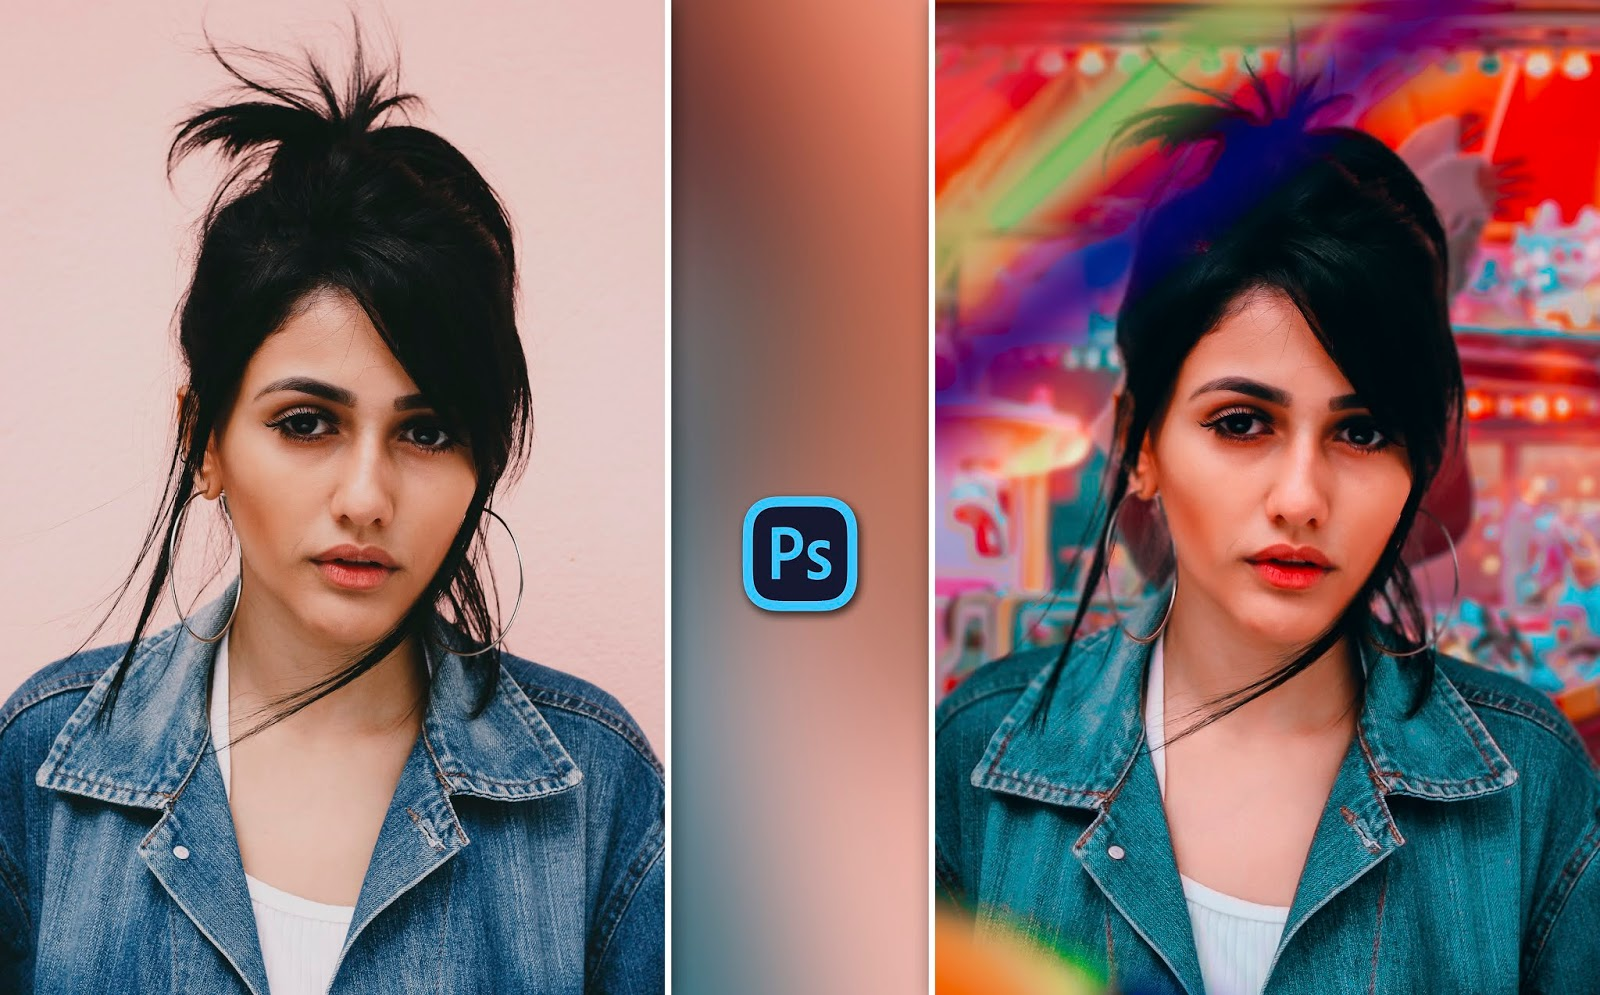 How to Edit Portrait Like @marksingerman easily in Photoshop | Marksingerman Style Photo Editing